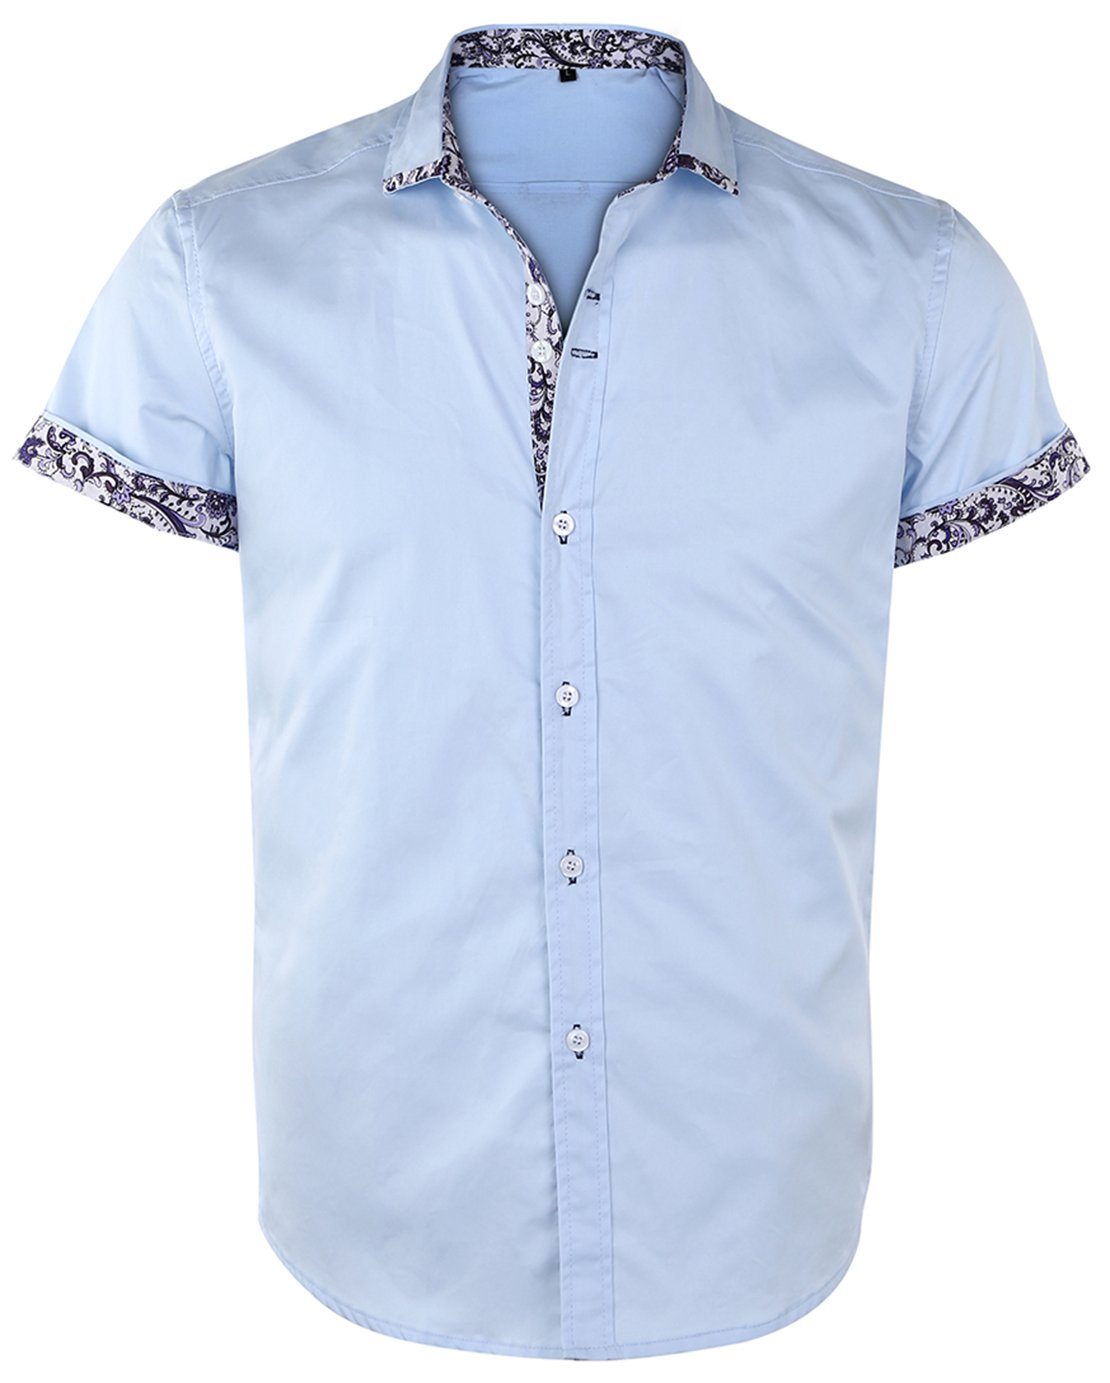 JEETOO Men's Floral Shirts Short Sleeve Print Dress Shirt Button Down Summer Casual Shirt (Small, SkyBlue)